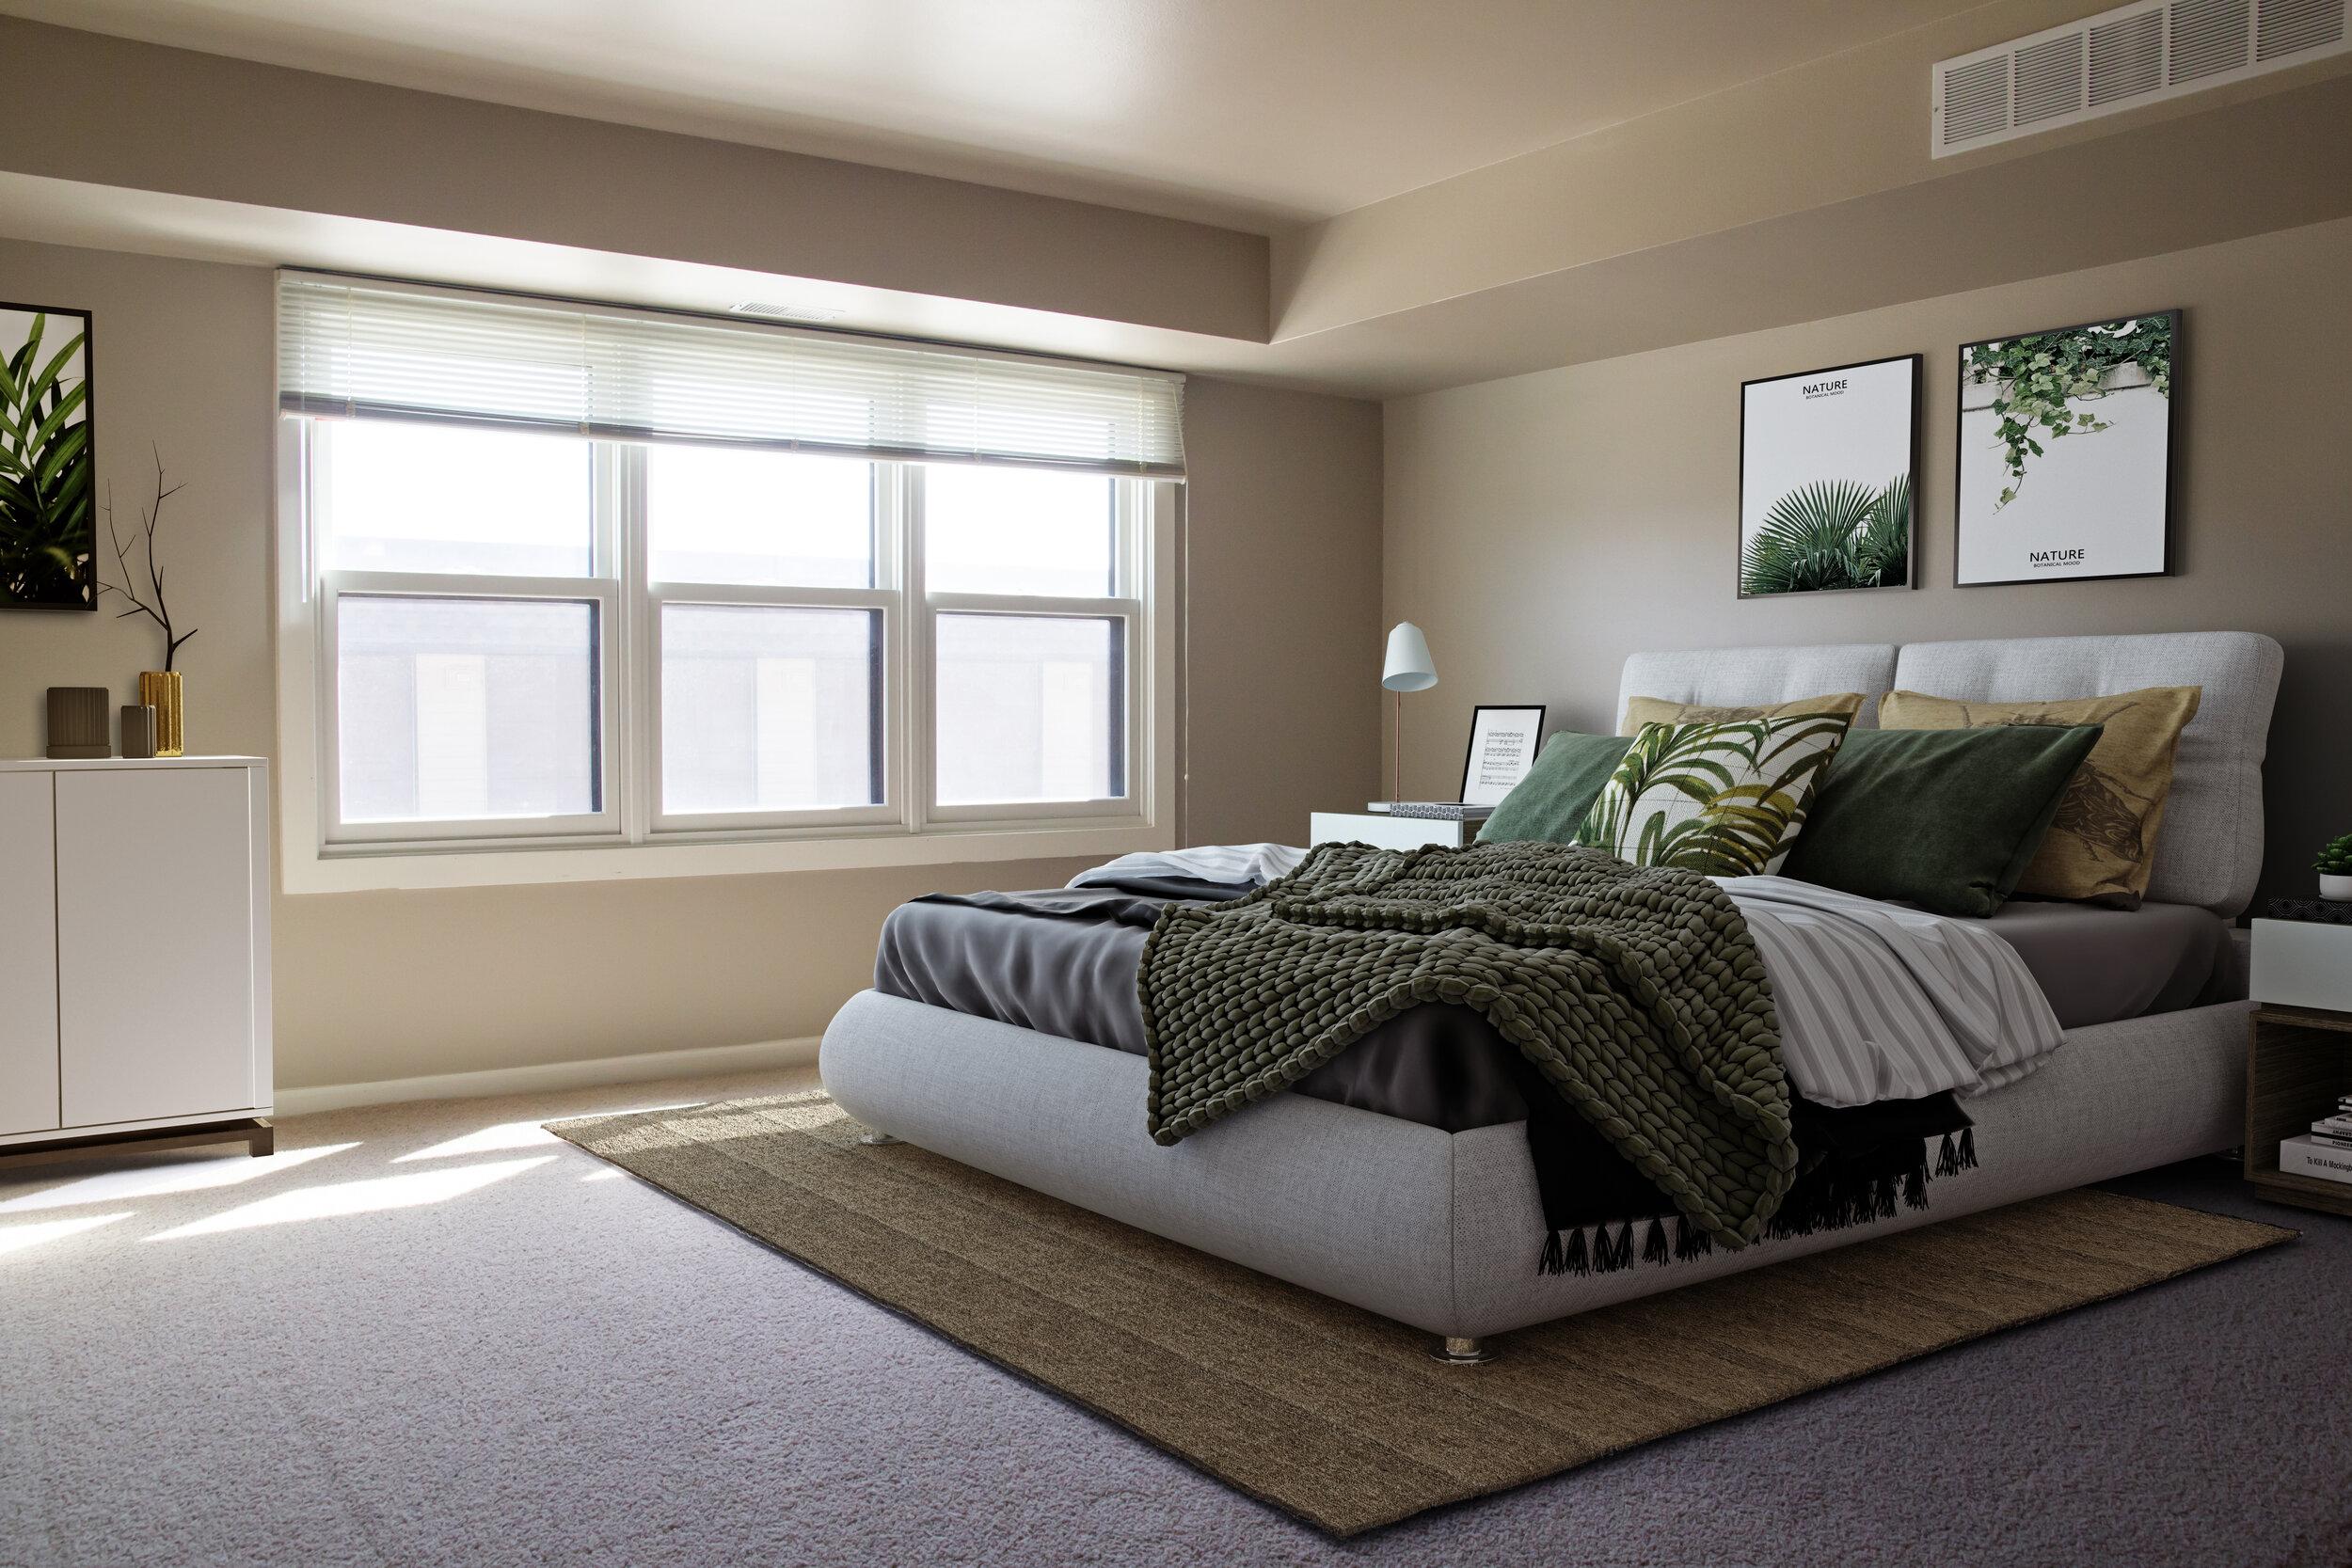 05 Cozy Bedrooms with Walk-In Closets.jpg